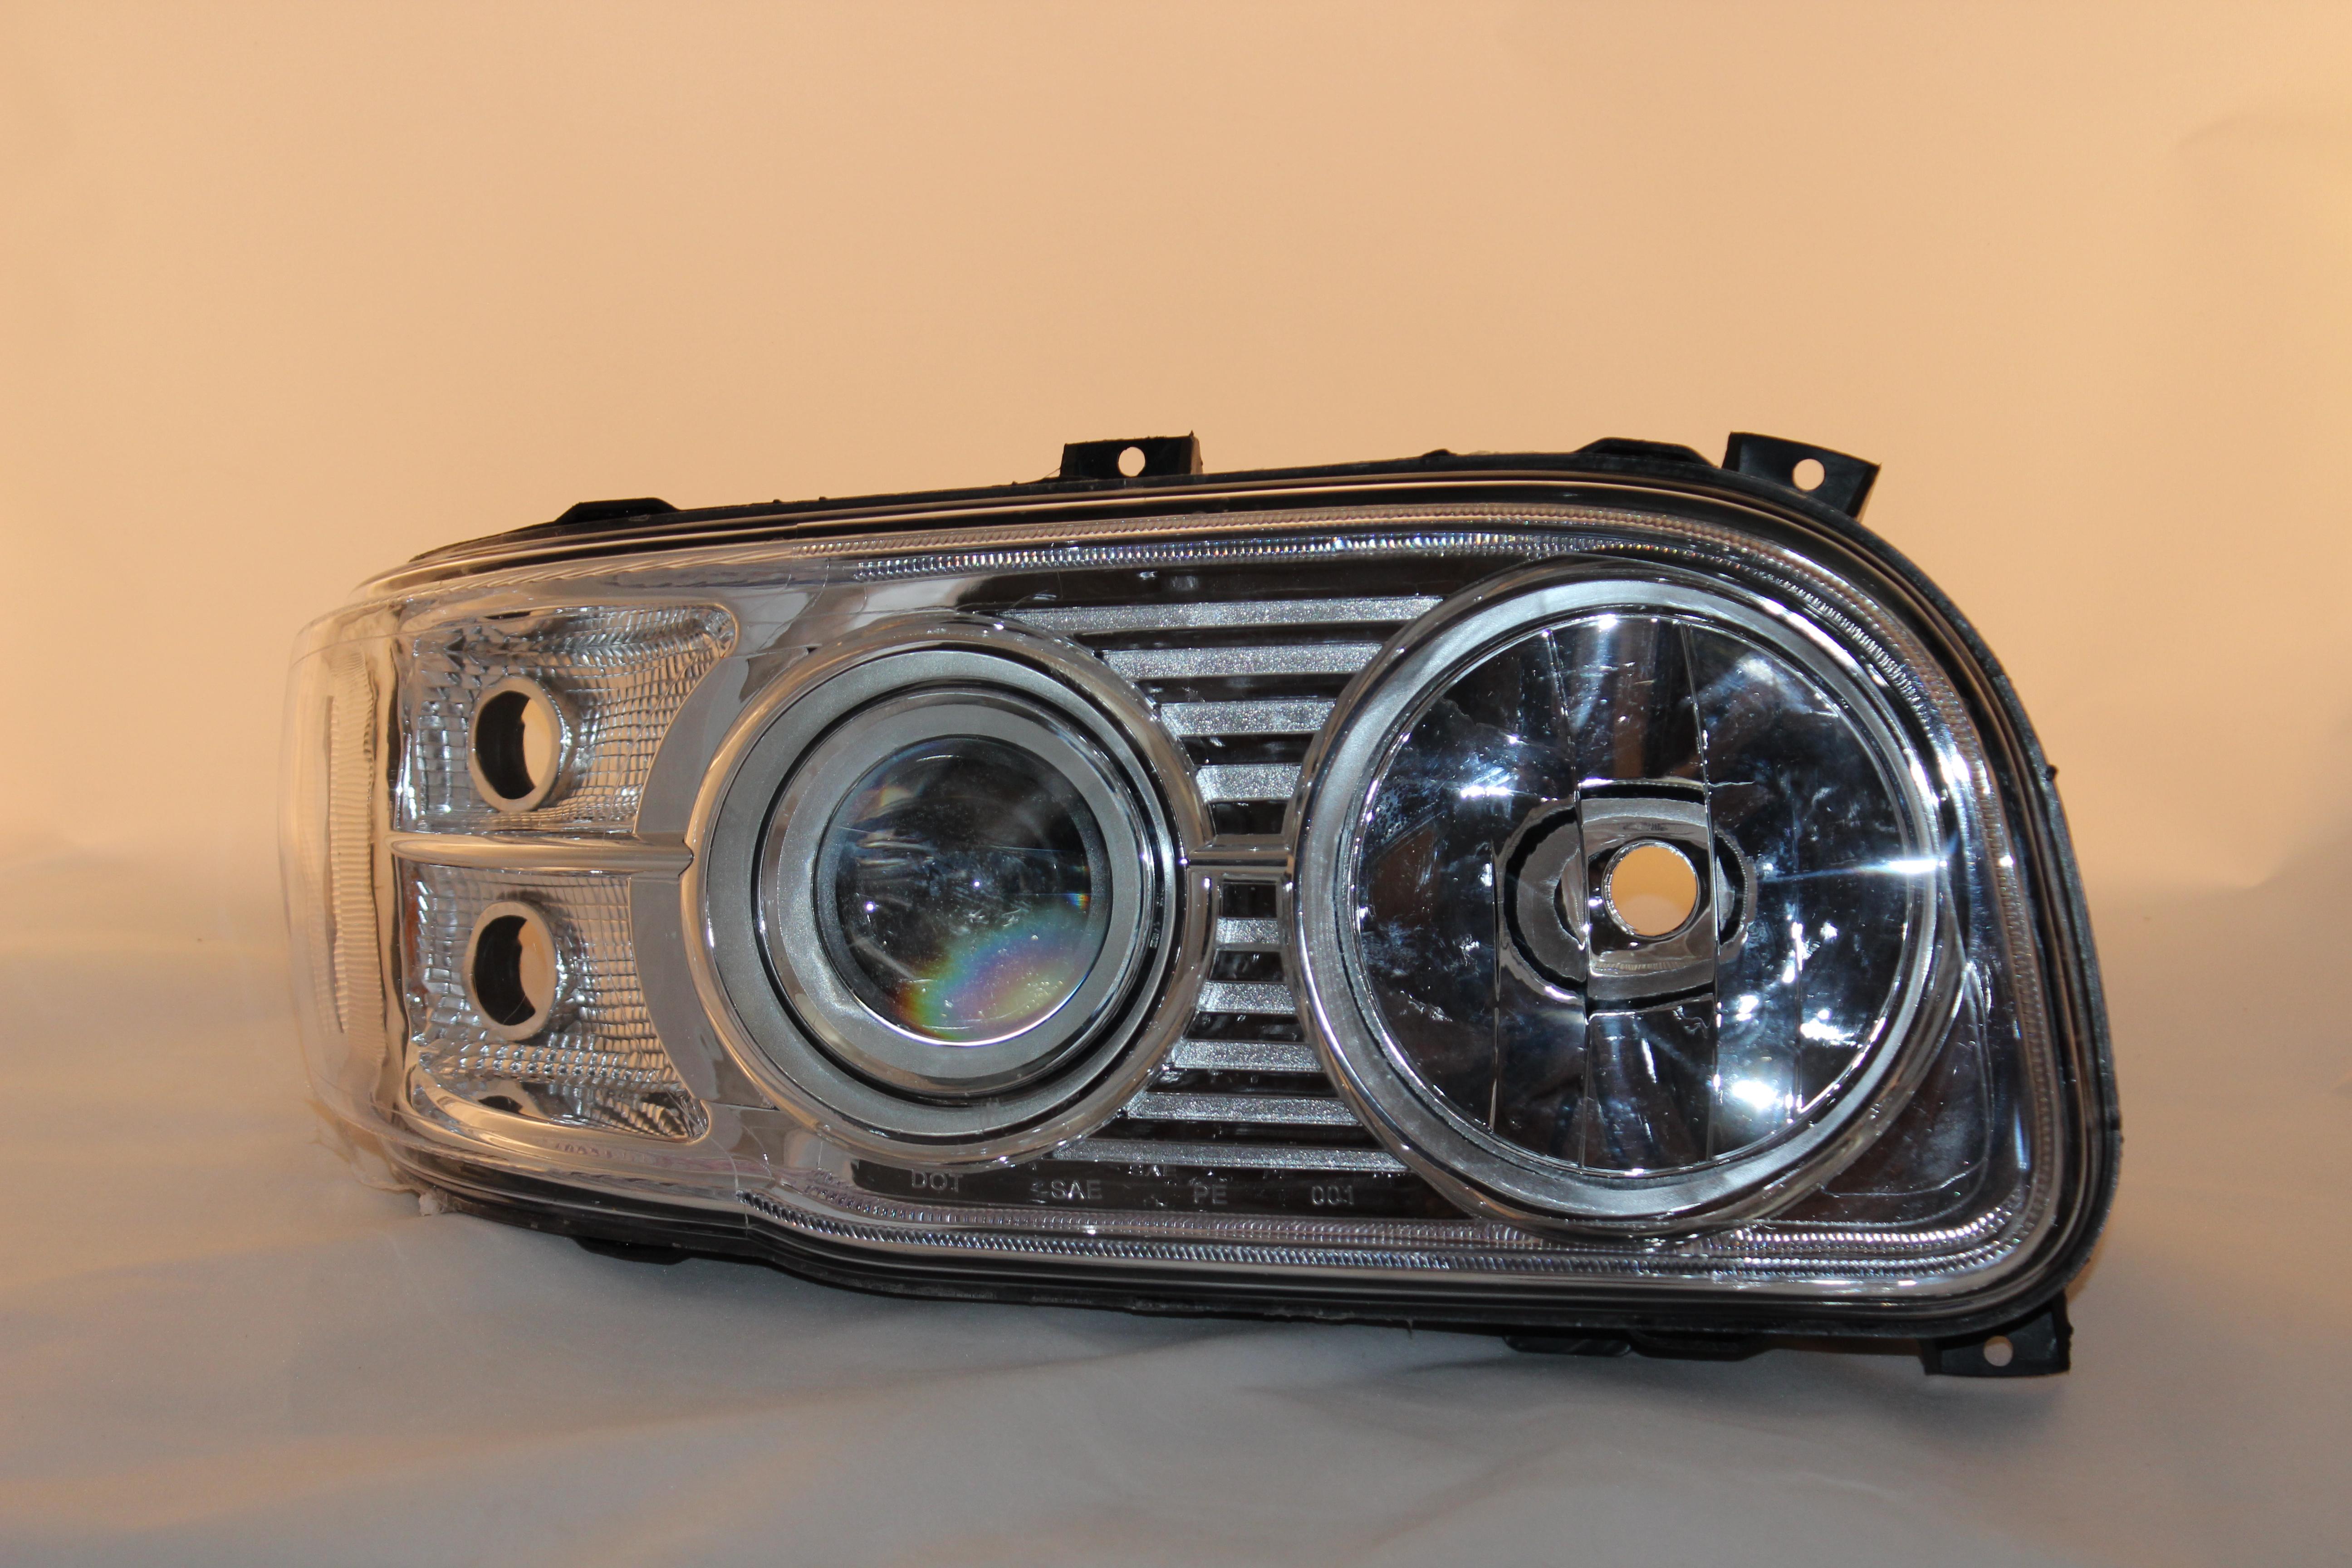 Peterbilt 388 389 567 Bi Xenon Projector Headlight Upgrade Wiring Diagram 579 Prev